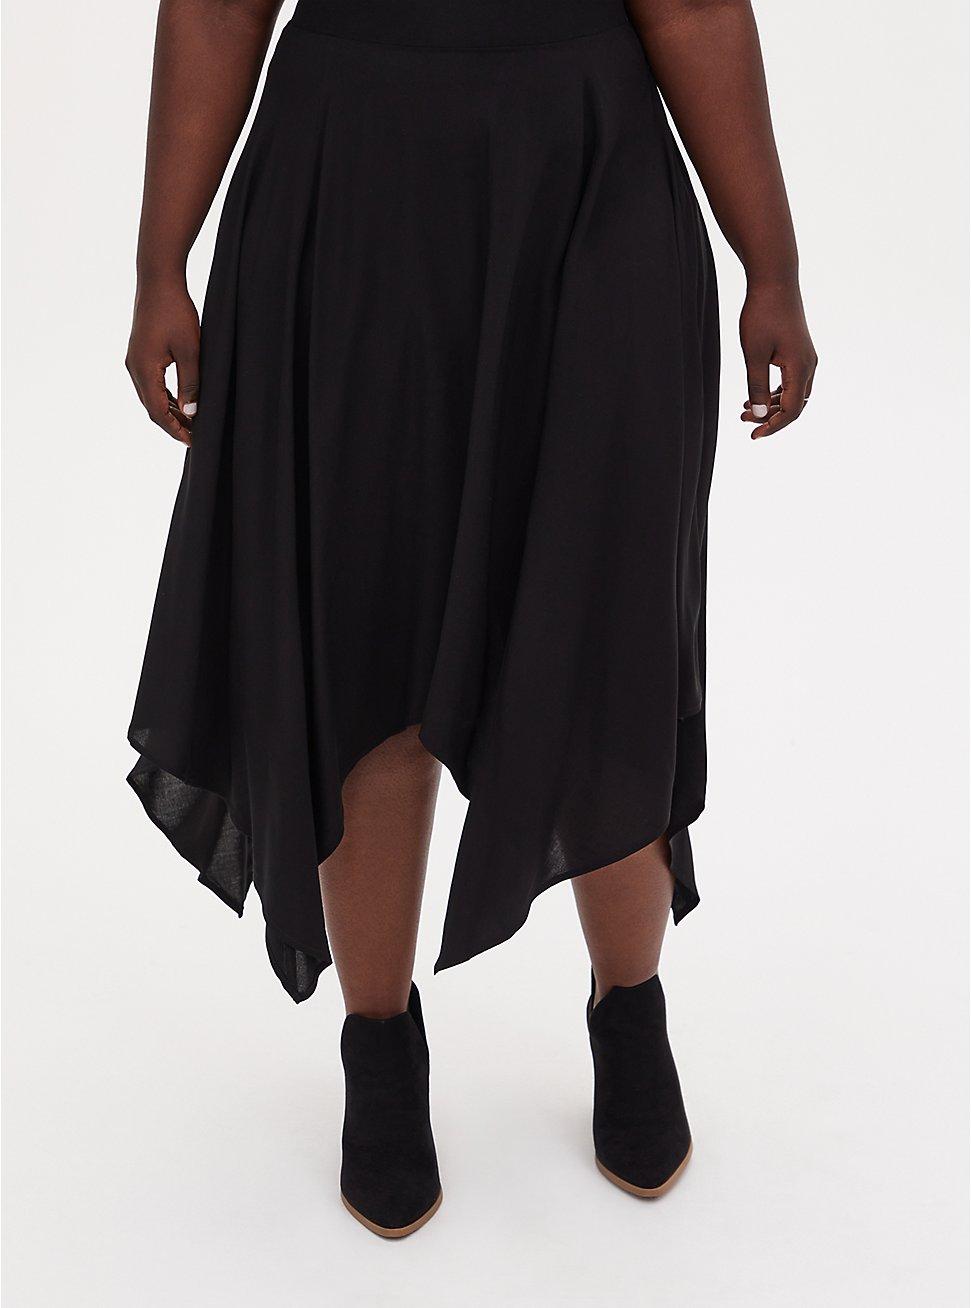 Black Challis Handkerchief Midi Skirt, DEEP BLACK, hi-res